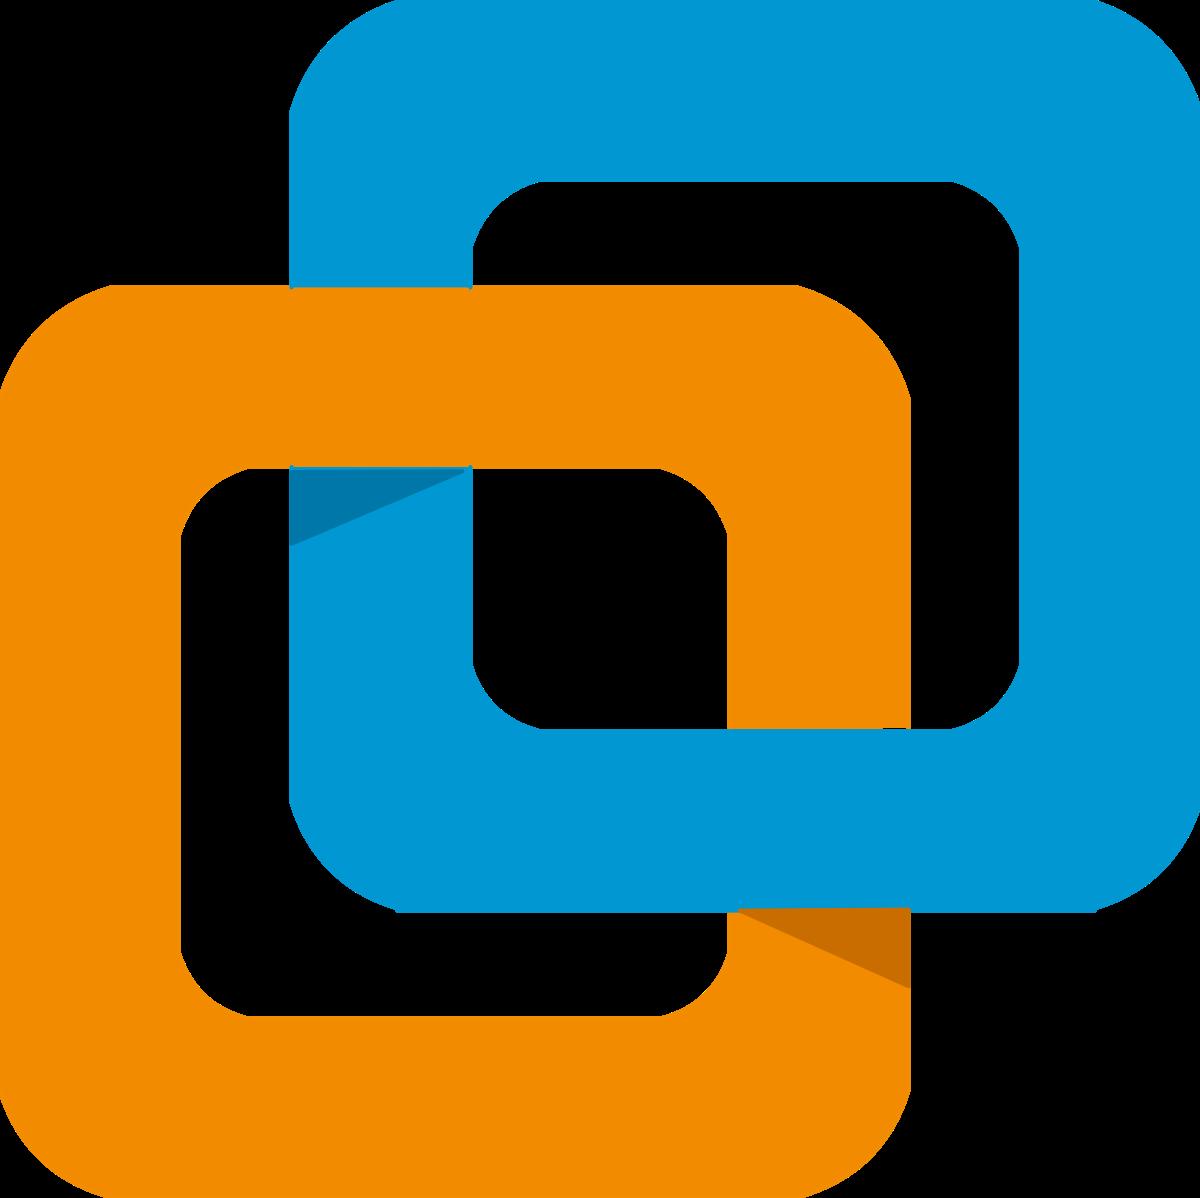 VMware Workstation Crack v16.1.2 + License Key Latest [2021]